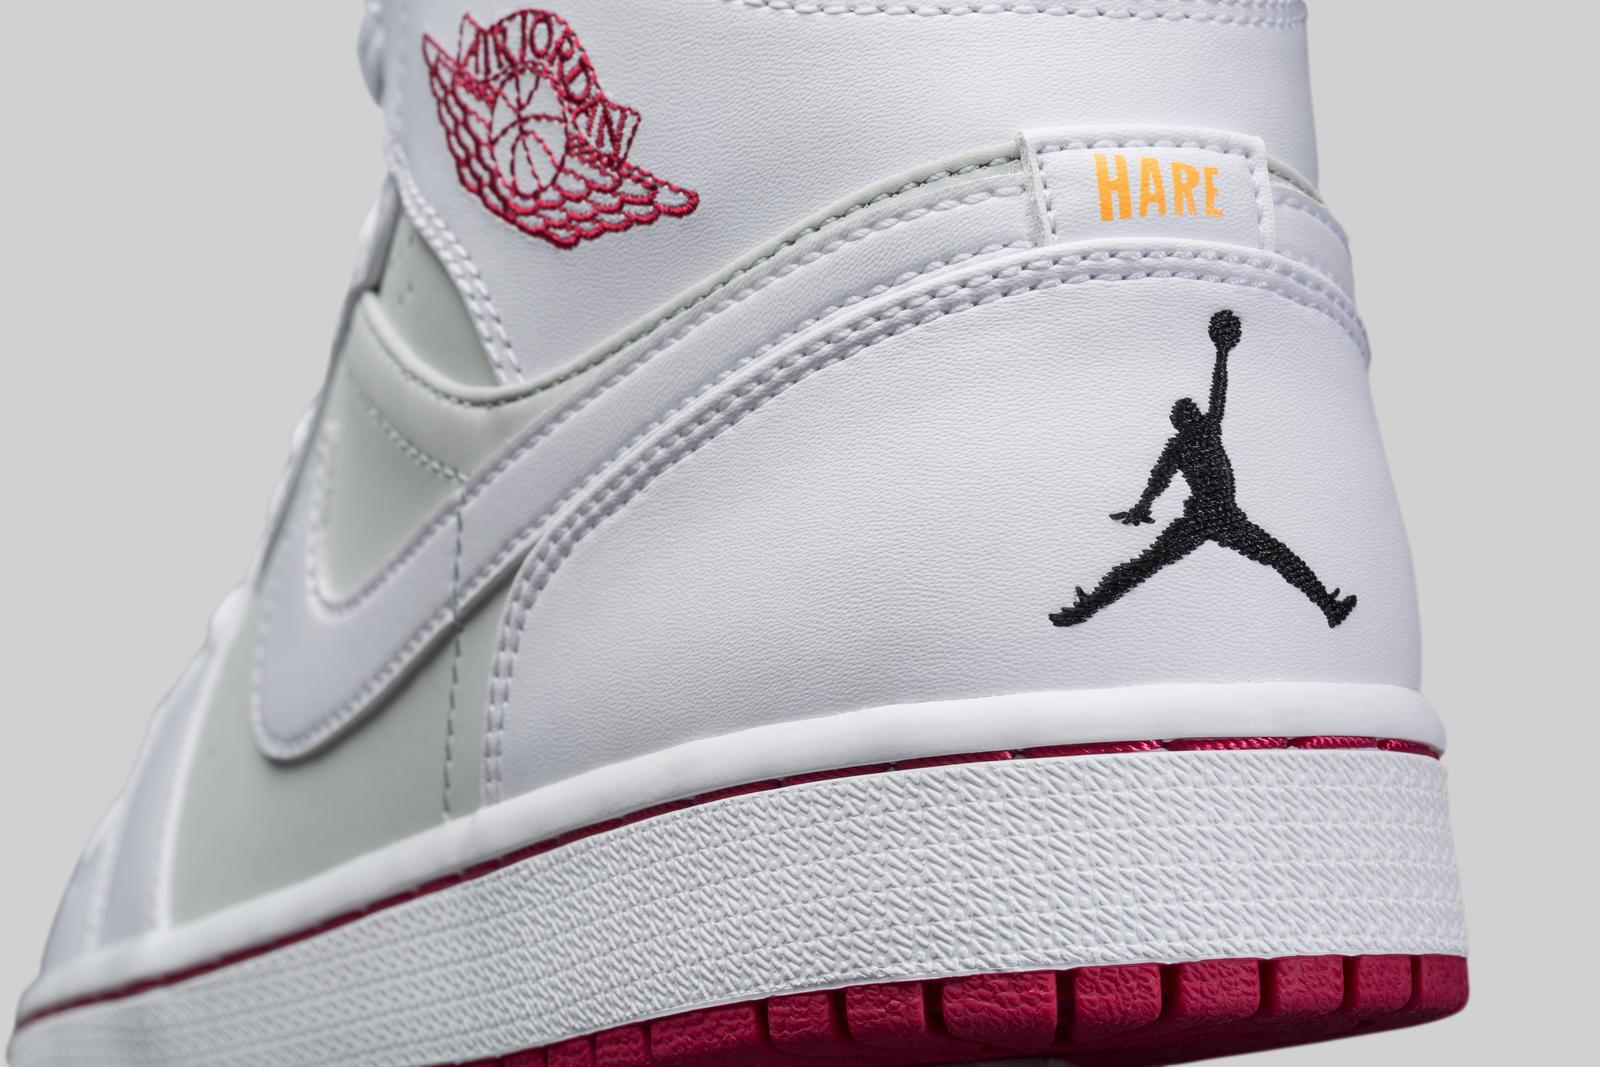 Bugs Bunny Tennis Shoes